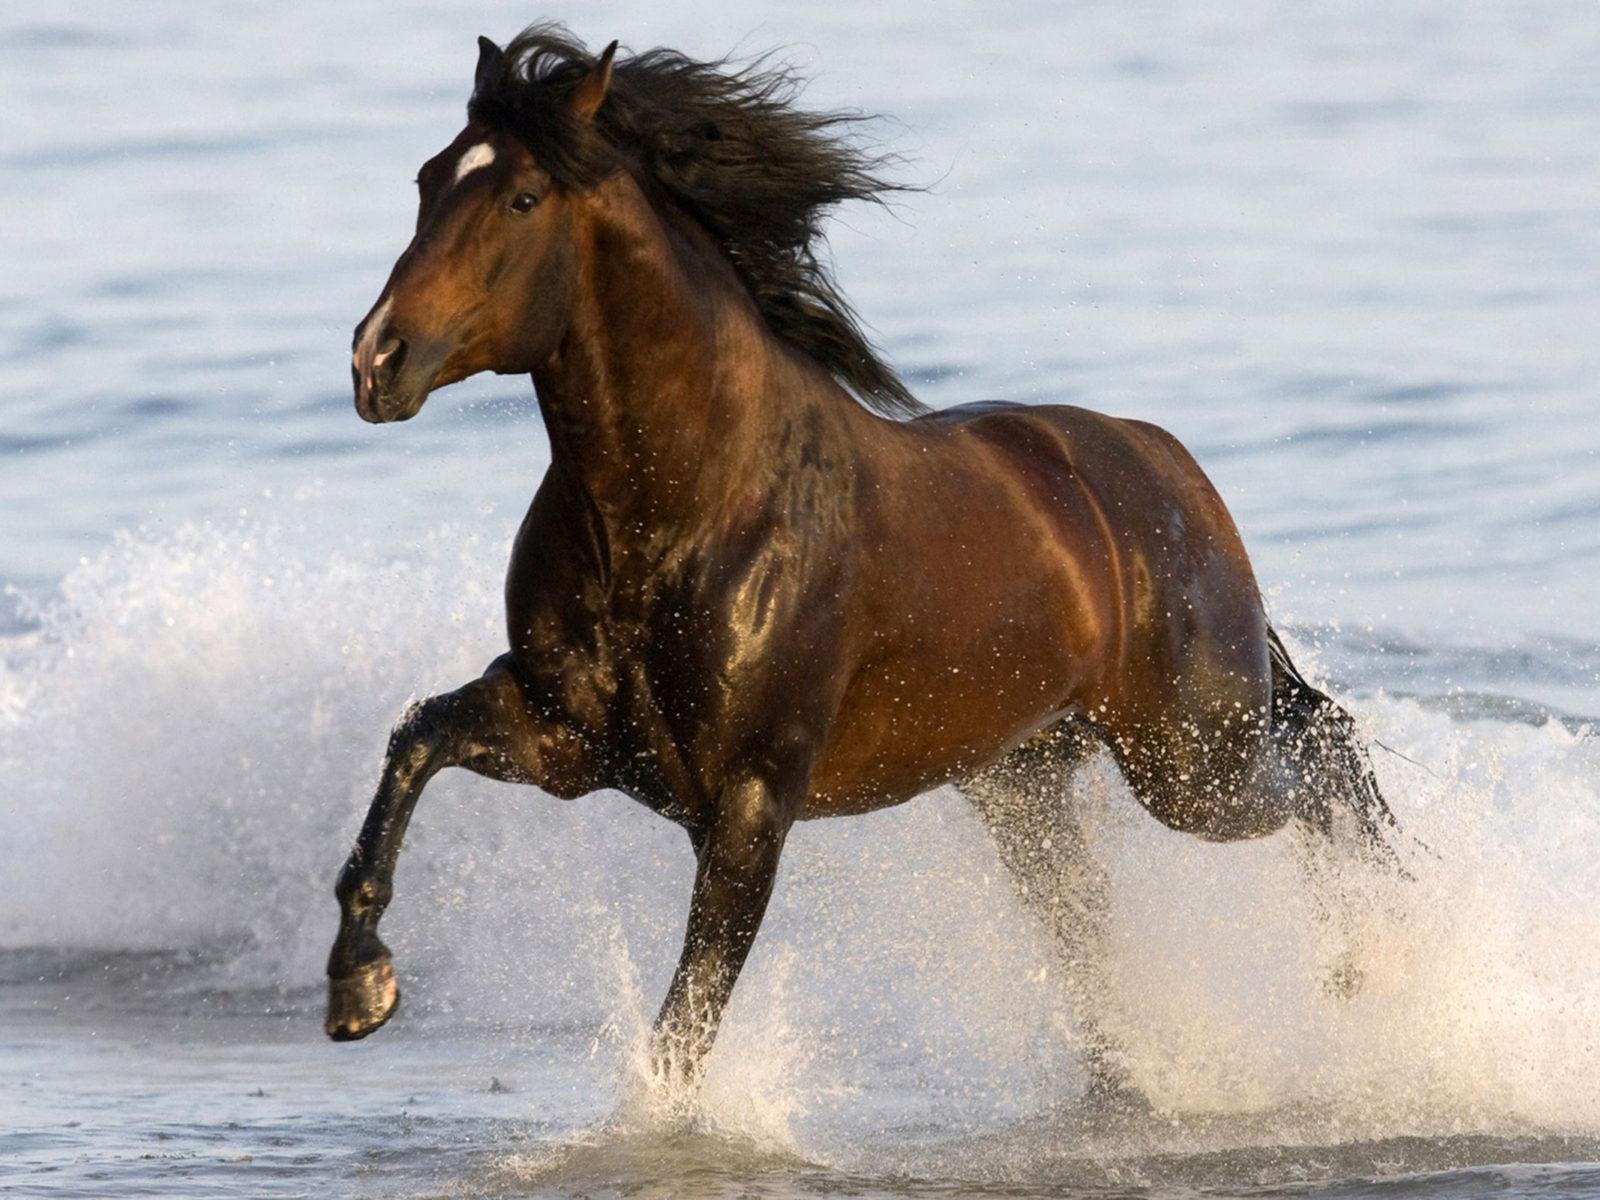 Cute Baby Horse Wallpaper Animals Black Horse Beach Sea Water Desktop Hd Wallpaper